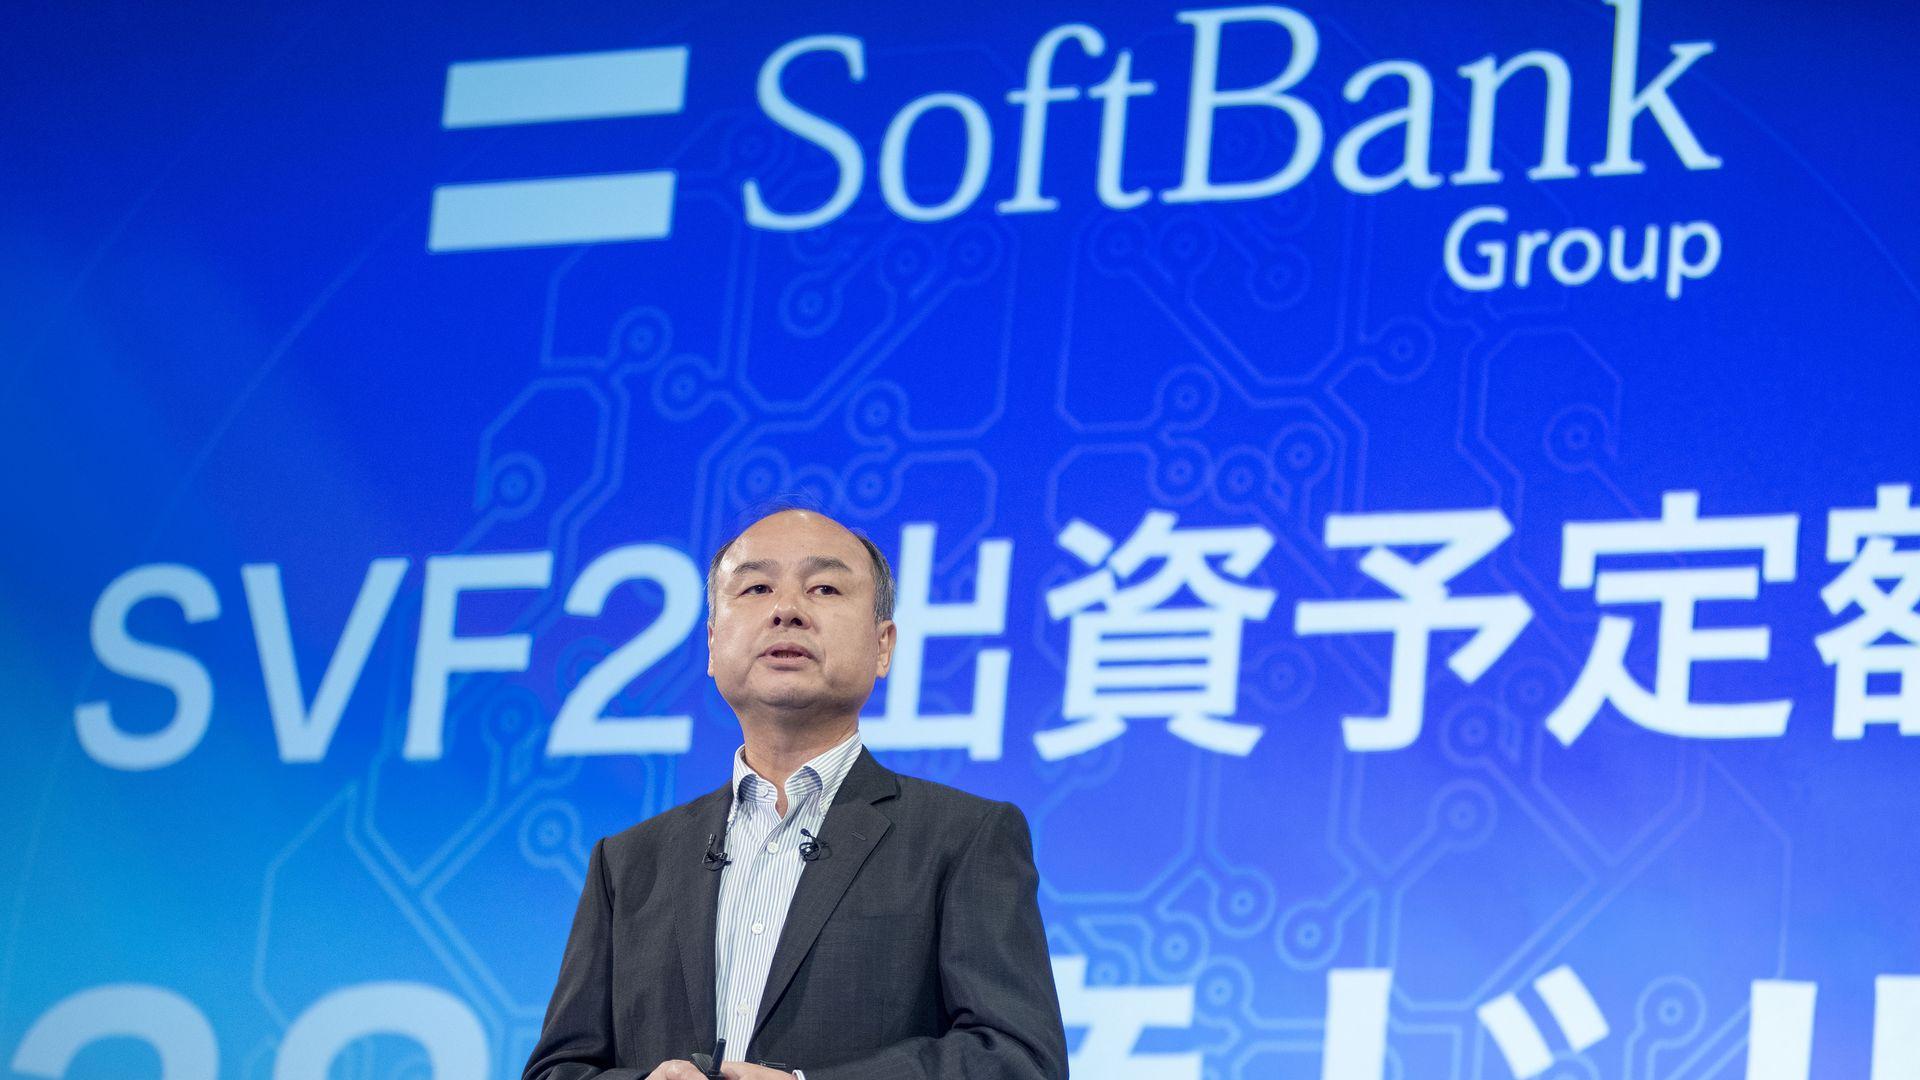 SoftBank Group CEO Son Masayoshi presents earnings figures